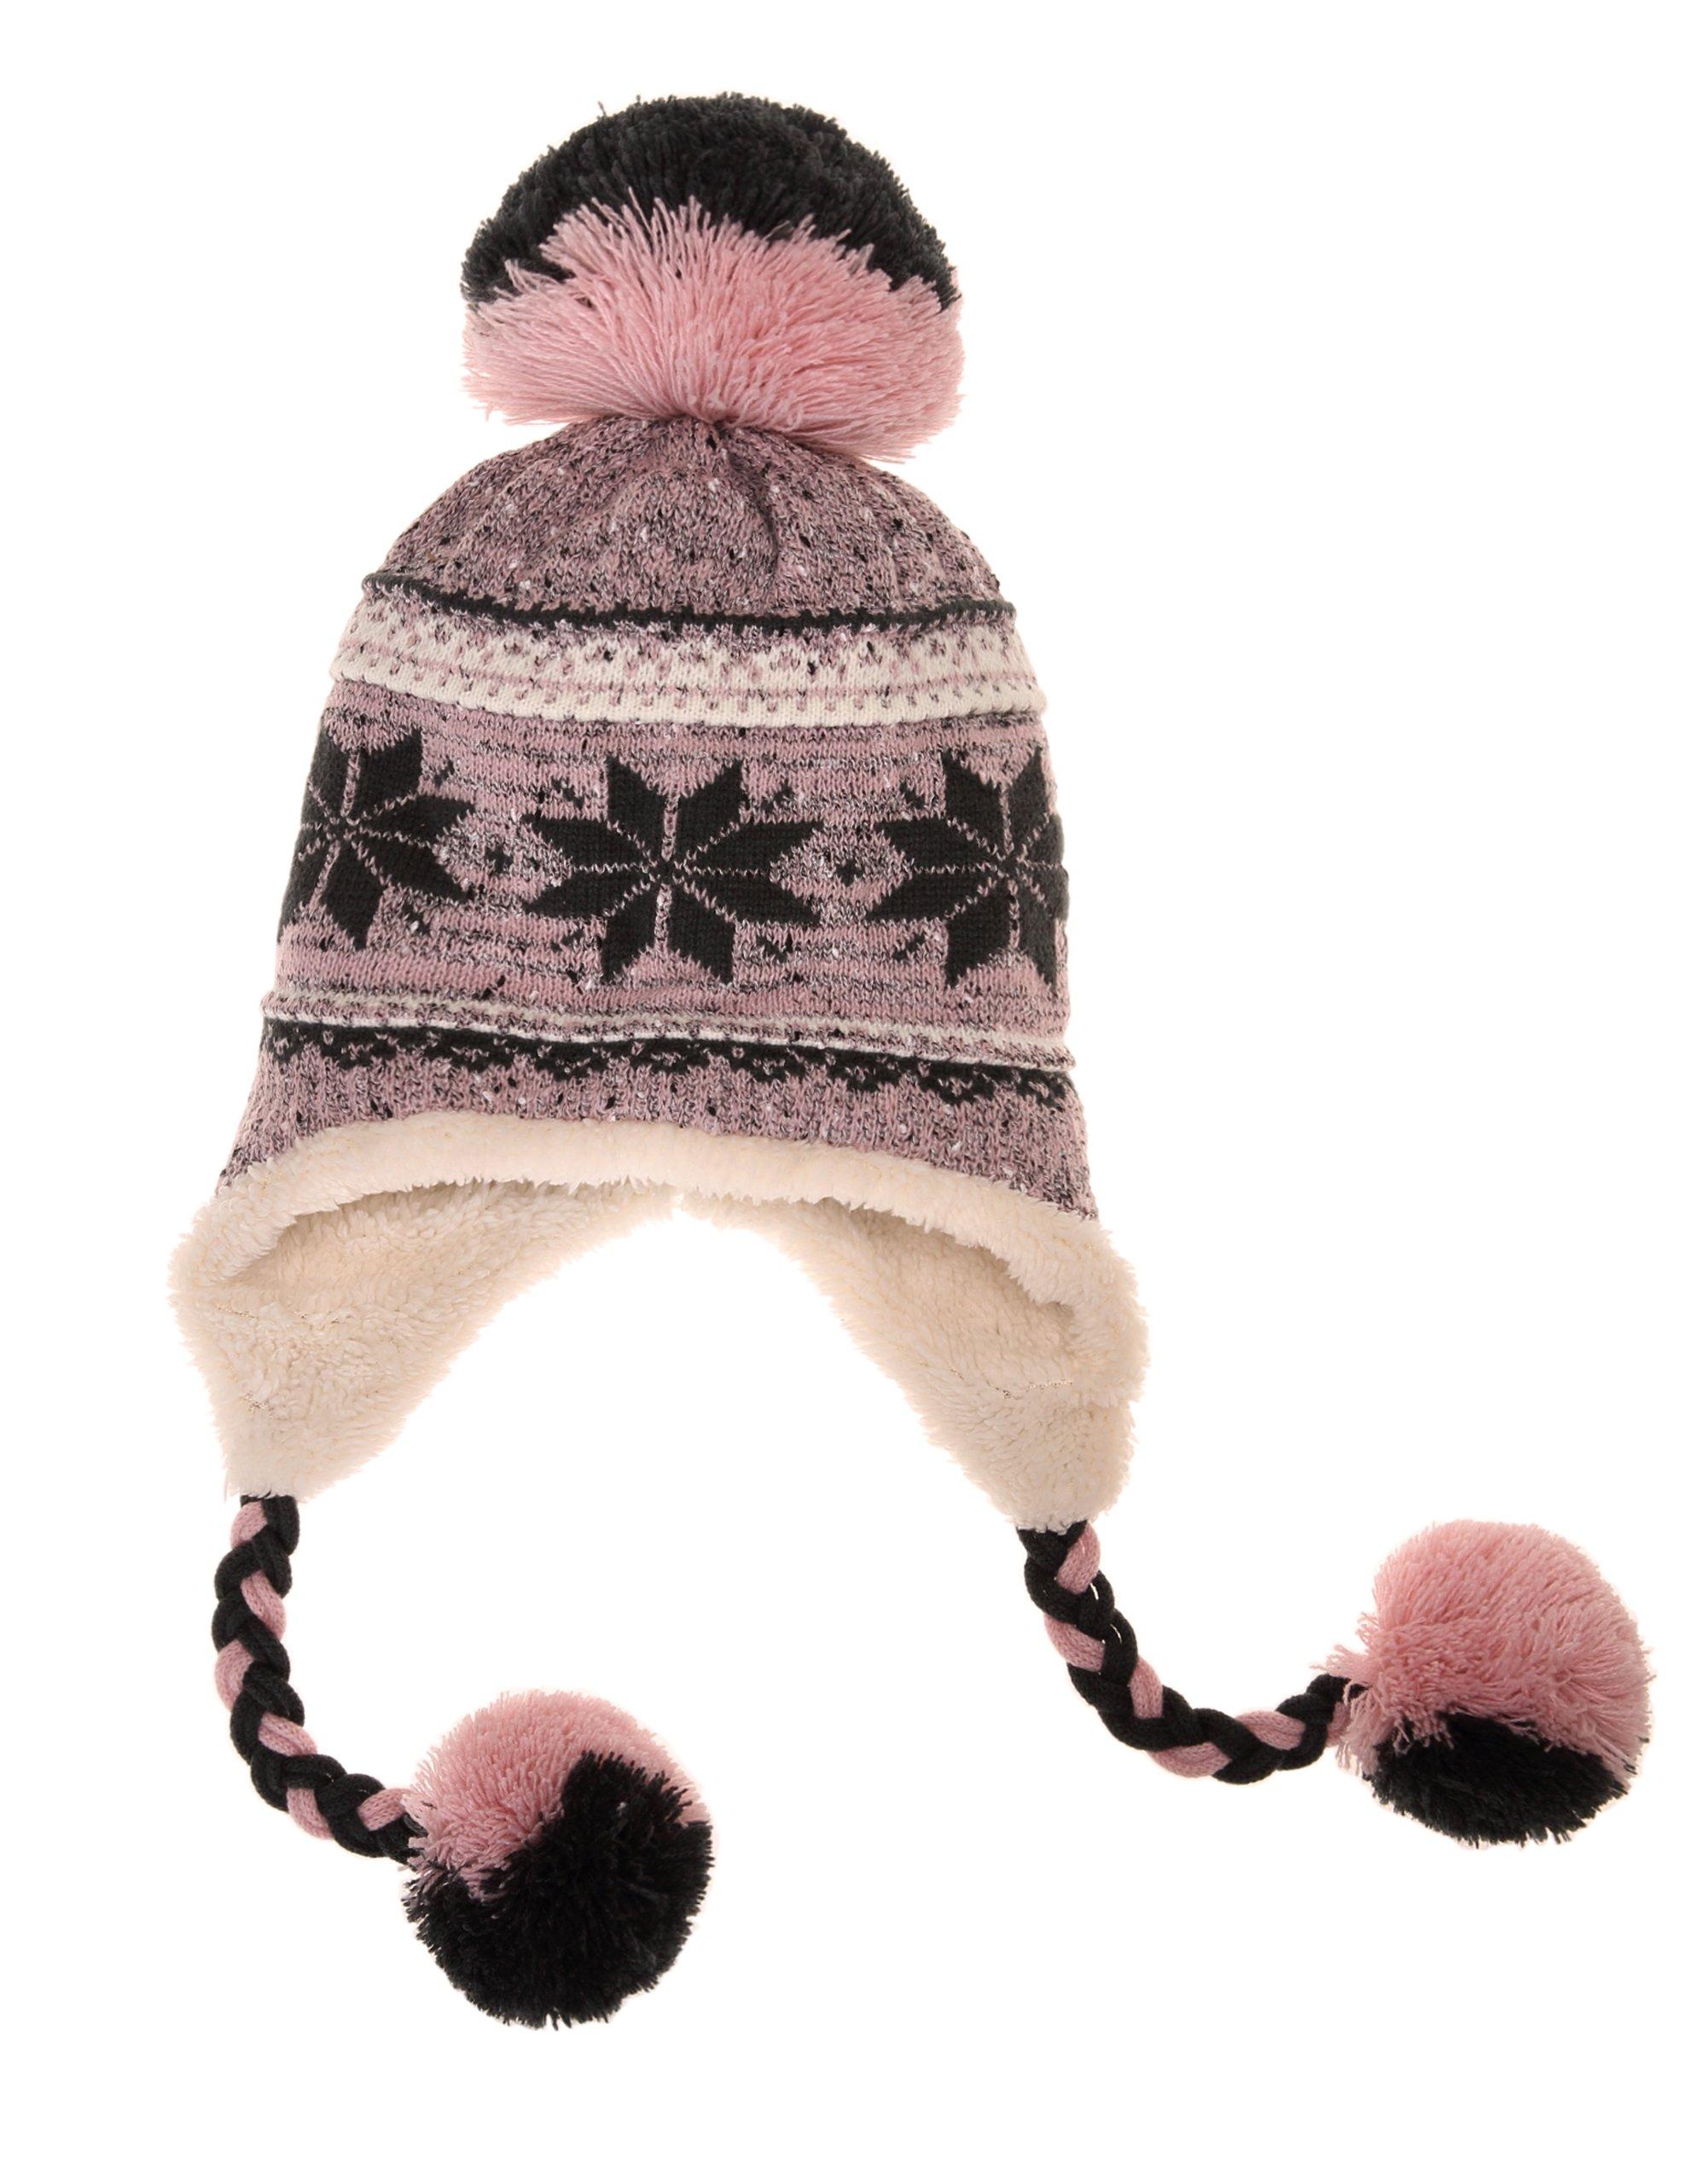 a29e2a52e Dosoni Women Girl Winter Hats Knit Soft Warm Earflap Hood Cozy Large ...